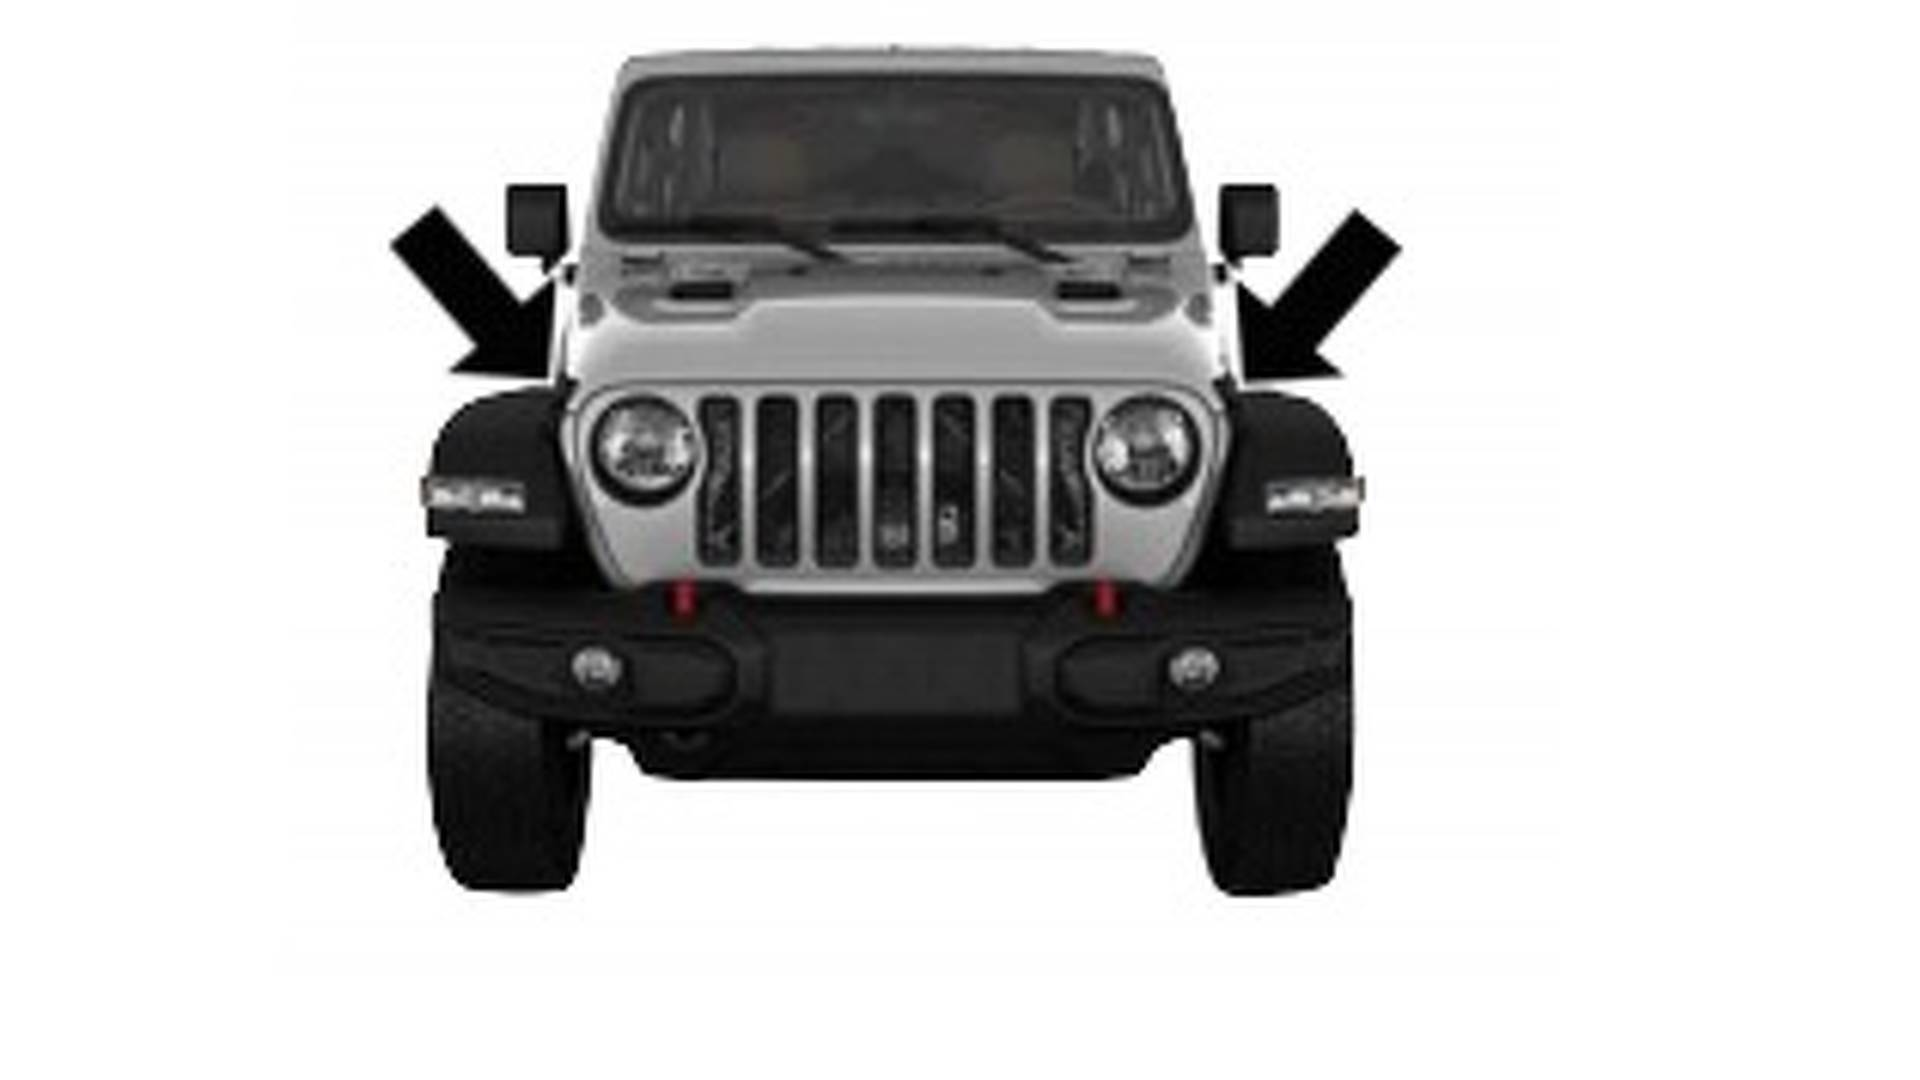 2008 jeep wrangler rubicon owners manual wiring library u2022 rh cadila zydus com 2008 jeep wrangler user manual 2008 jeep wrangler jk service manual pdf